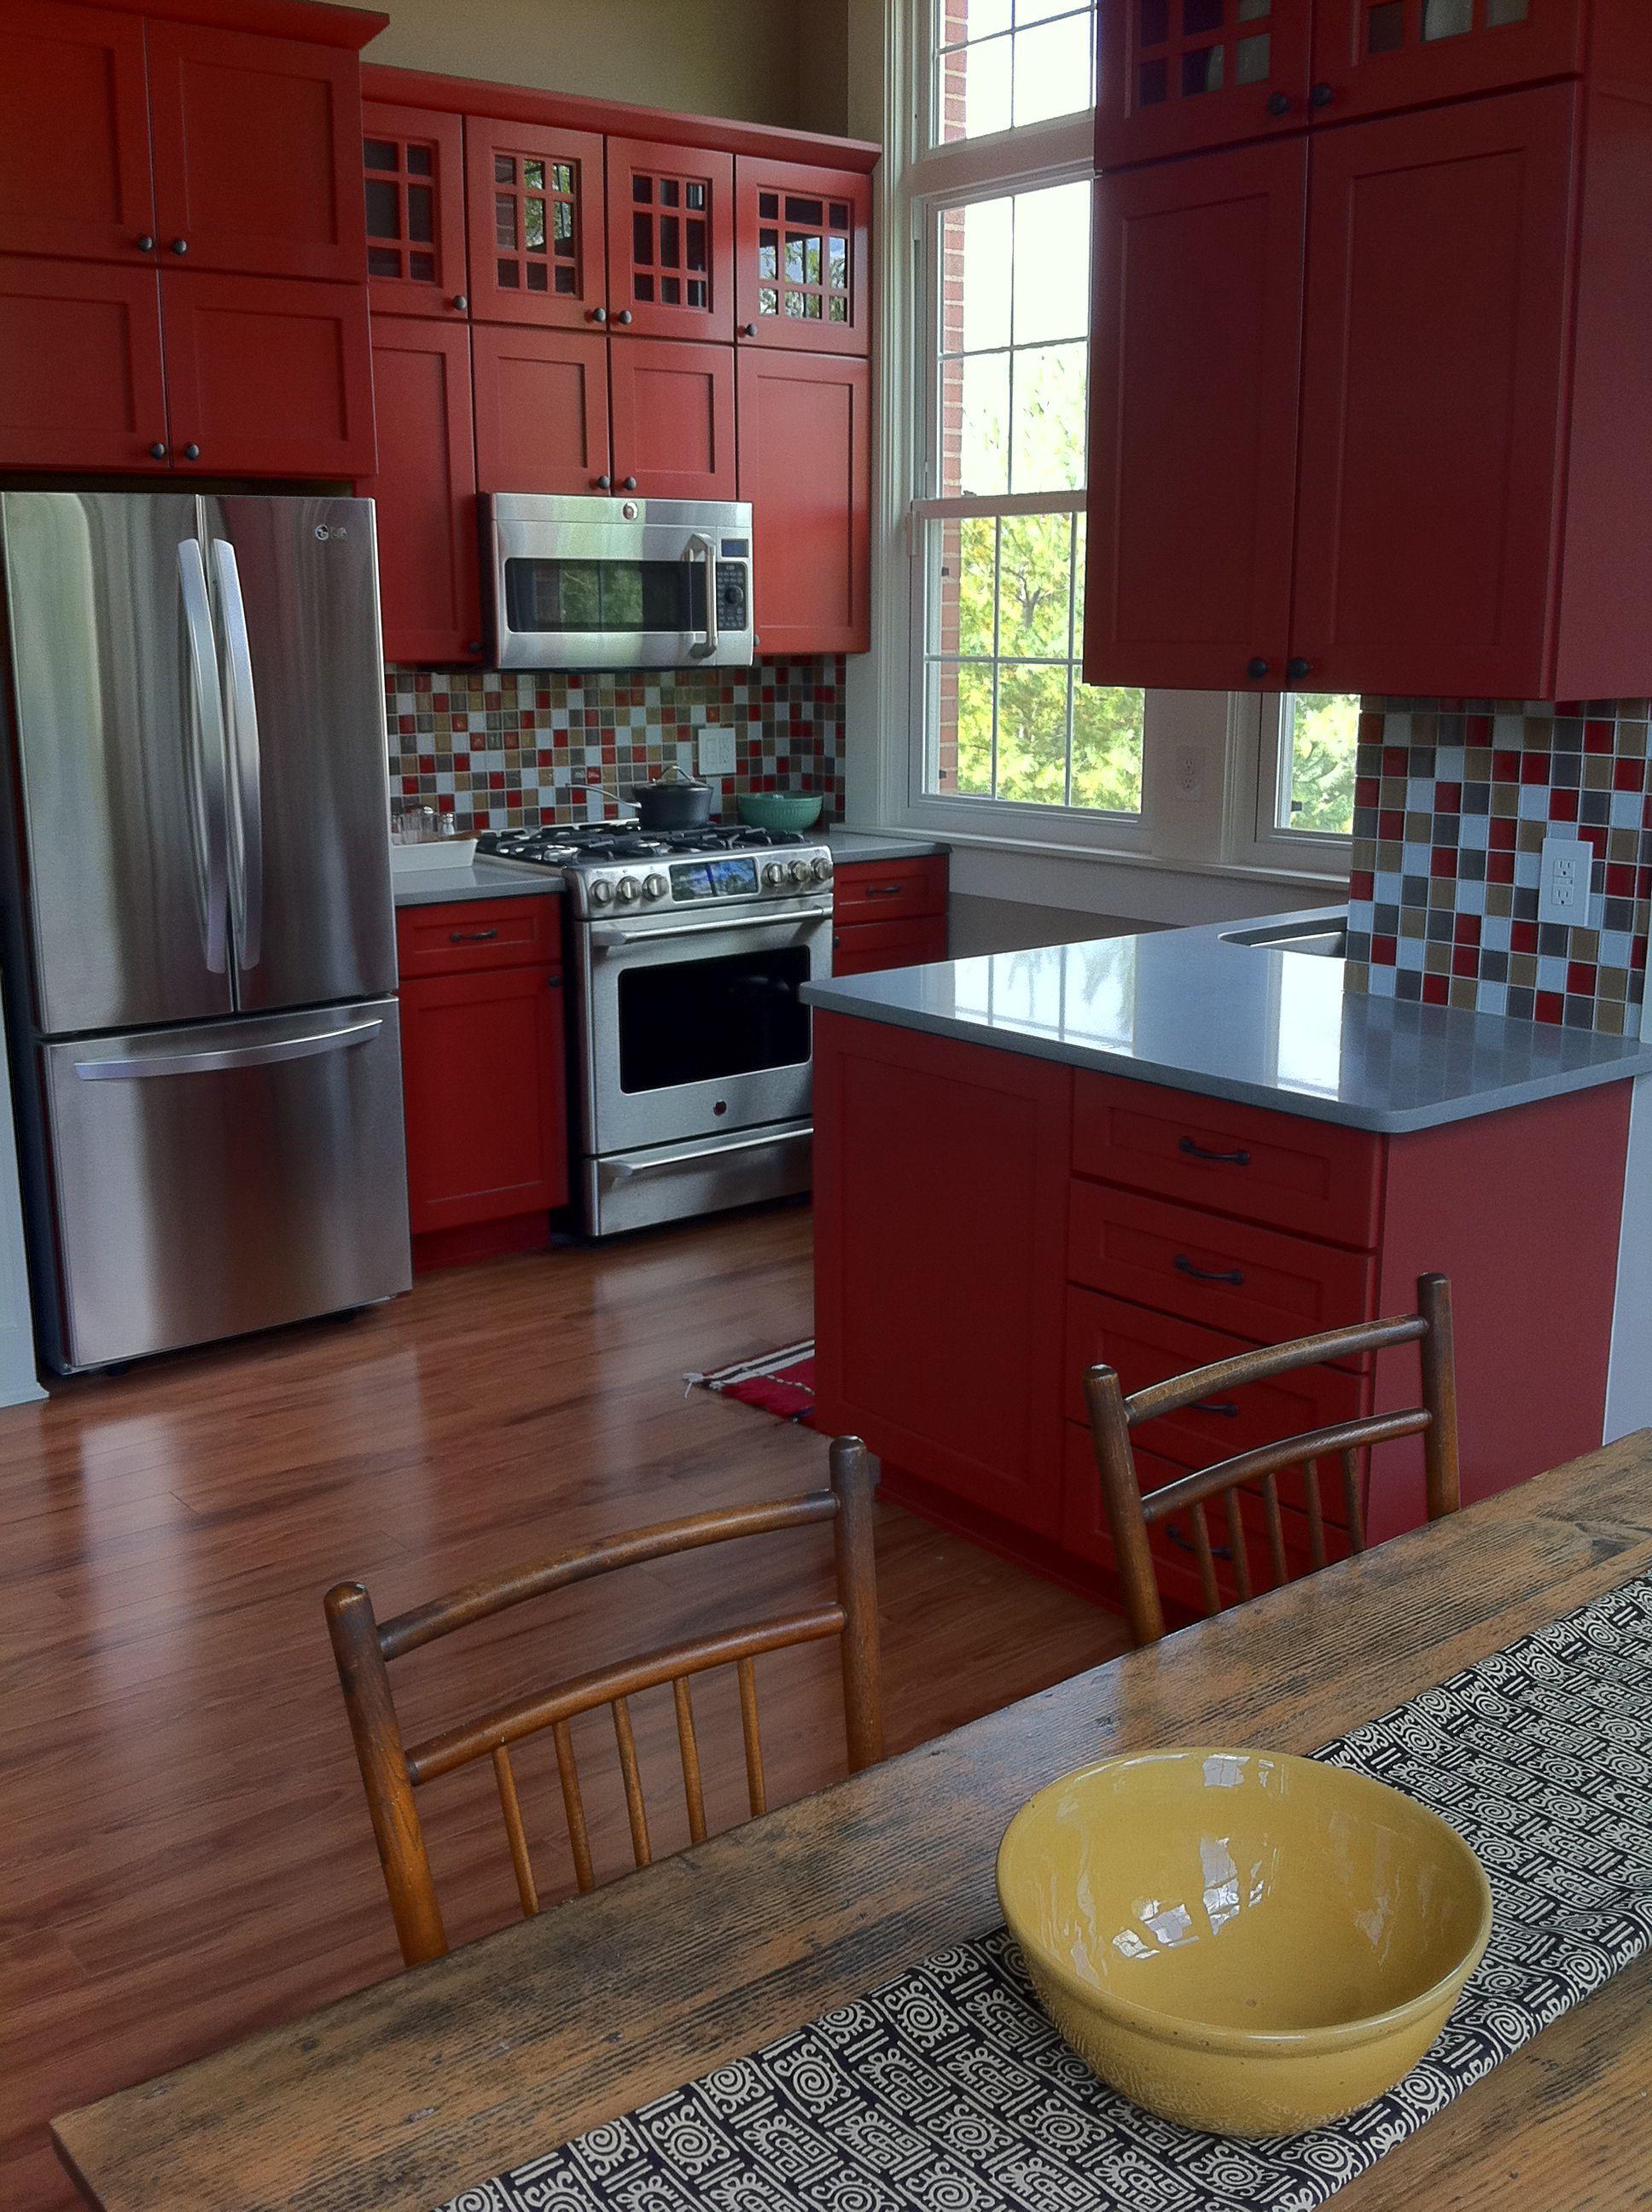 Red kitchen | Red kitchen cabinets, Red cabinets